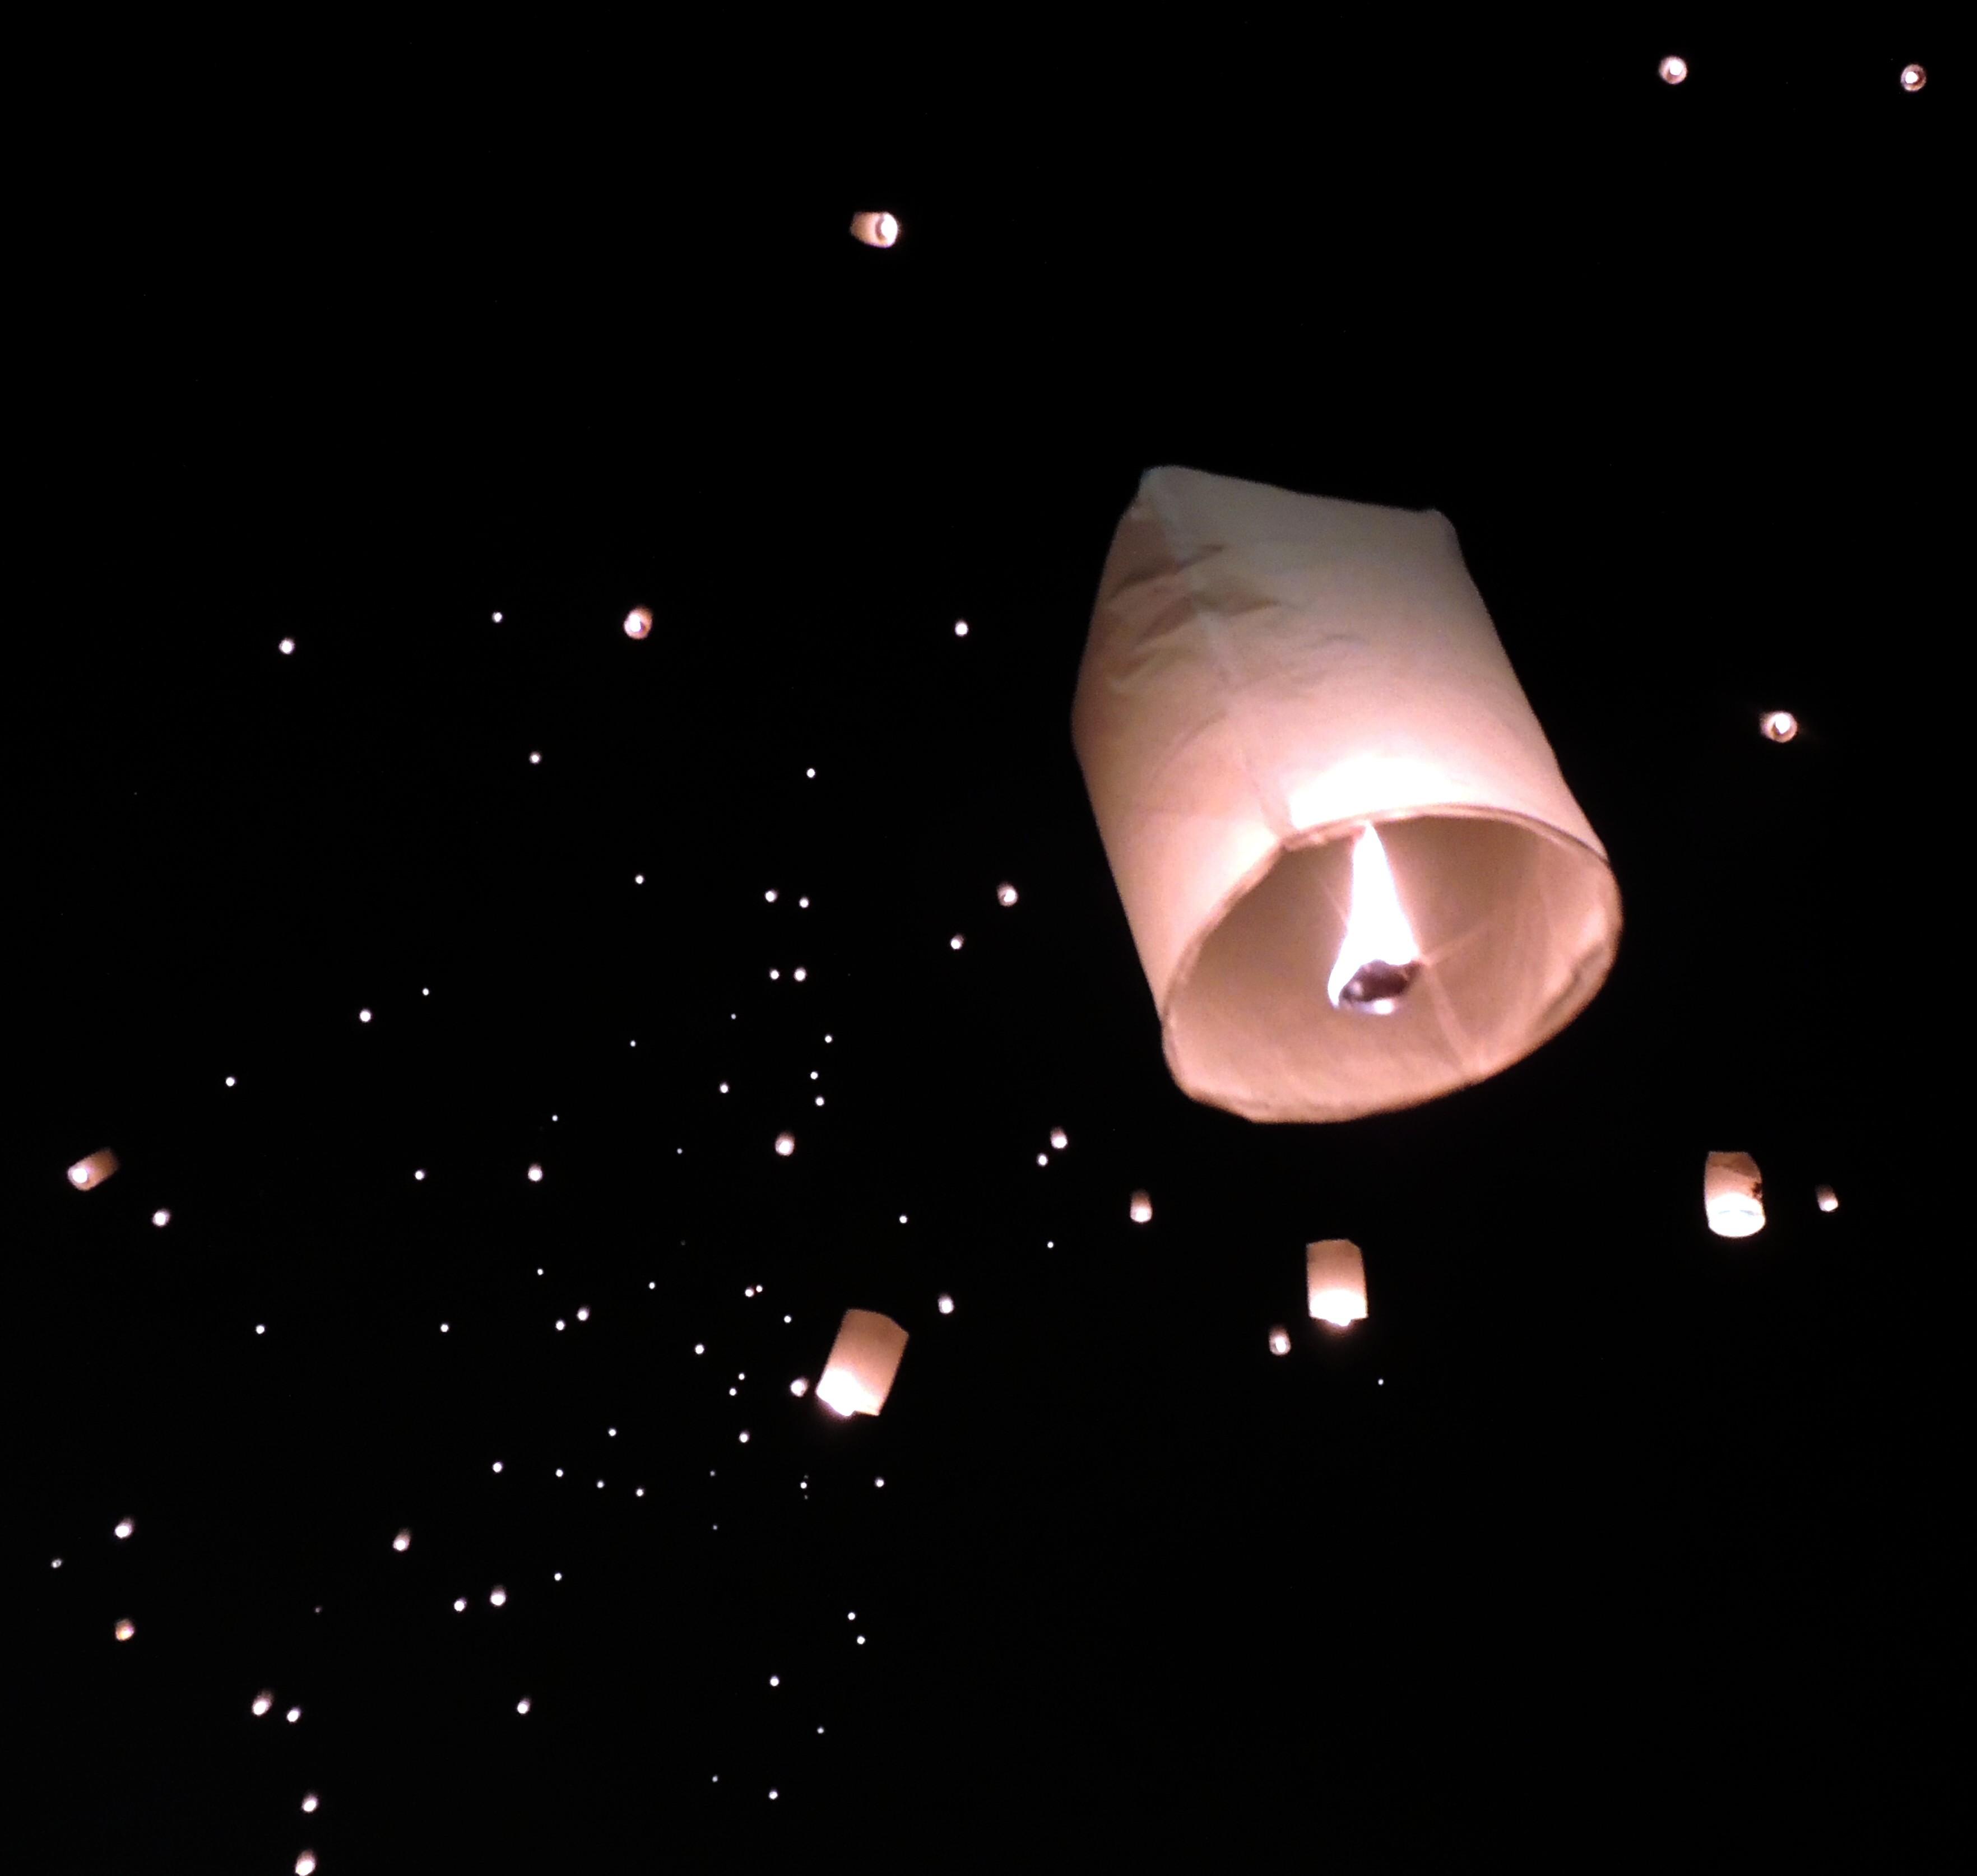 Gratis Afbeeldingen : licht, nacht, ster, ruimte, duisternis ...